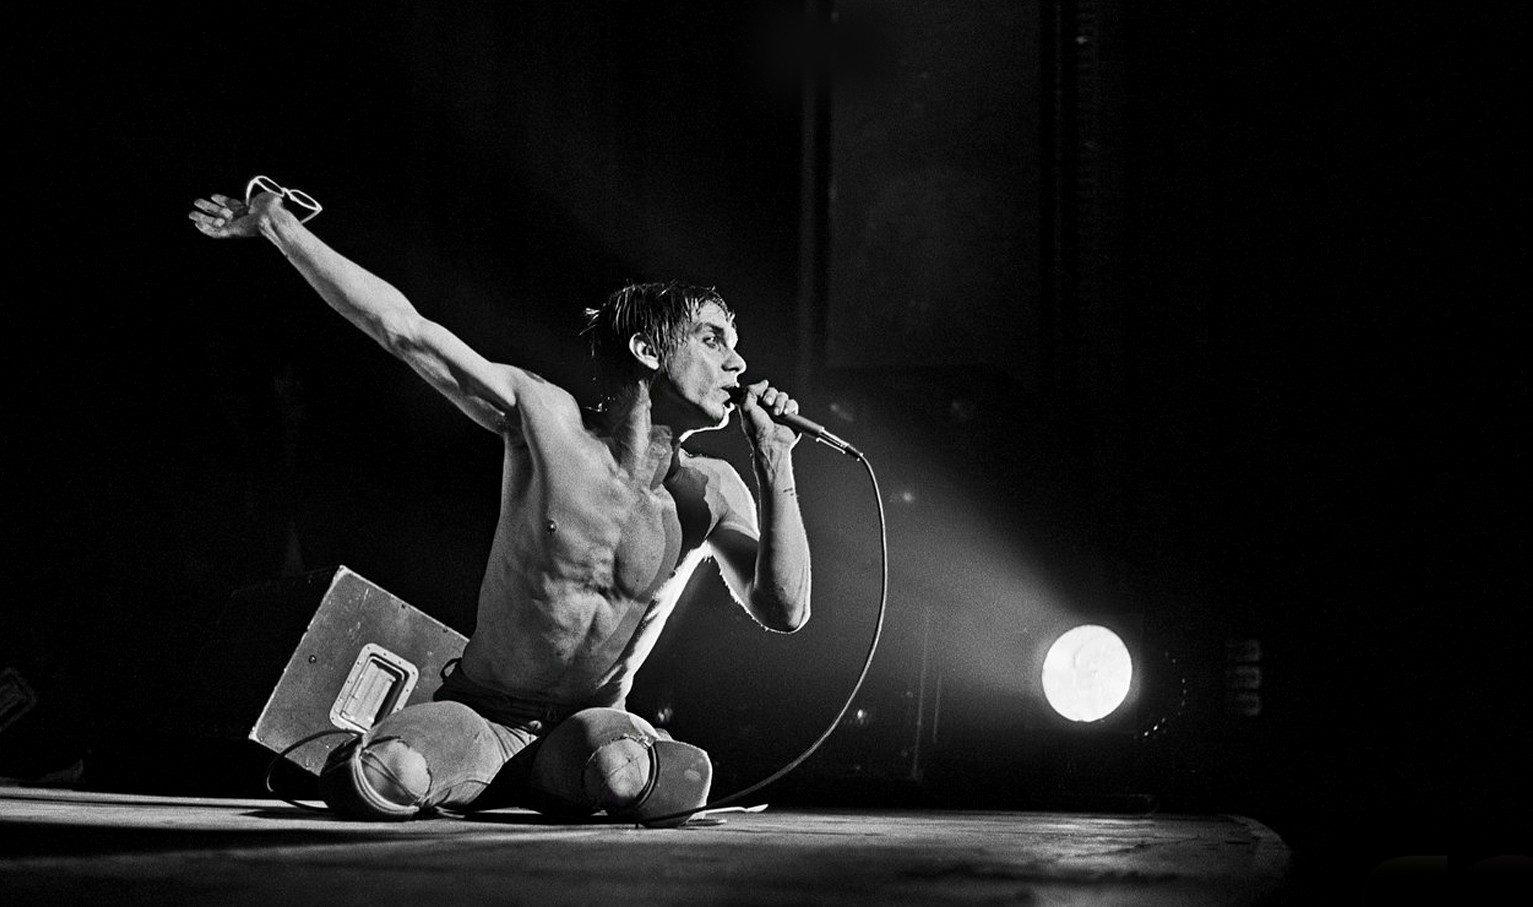 iggy pop i 70 anni dell'iguana del rock